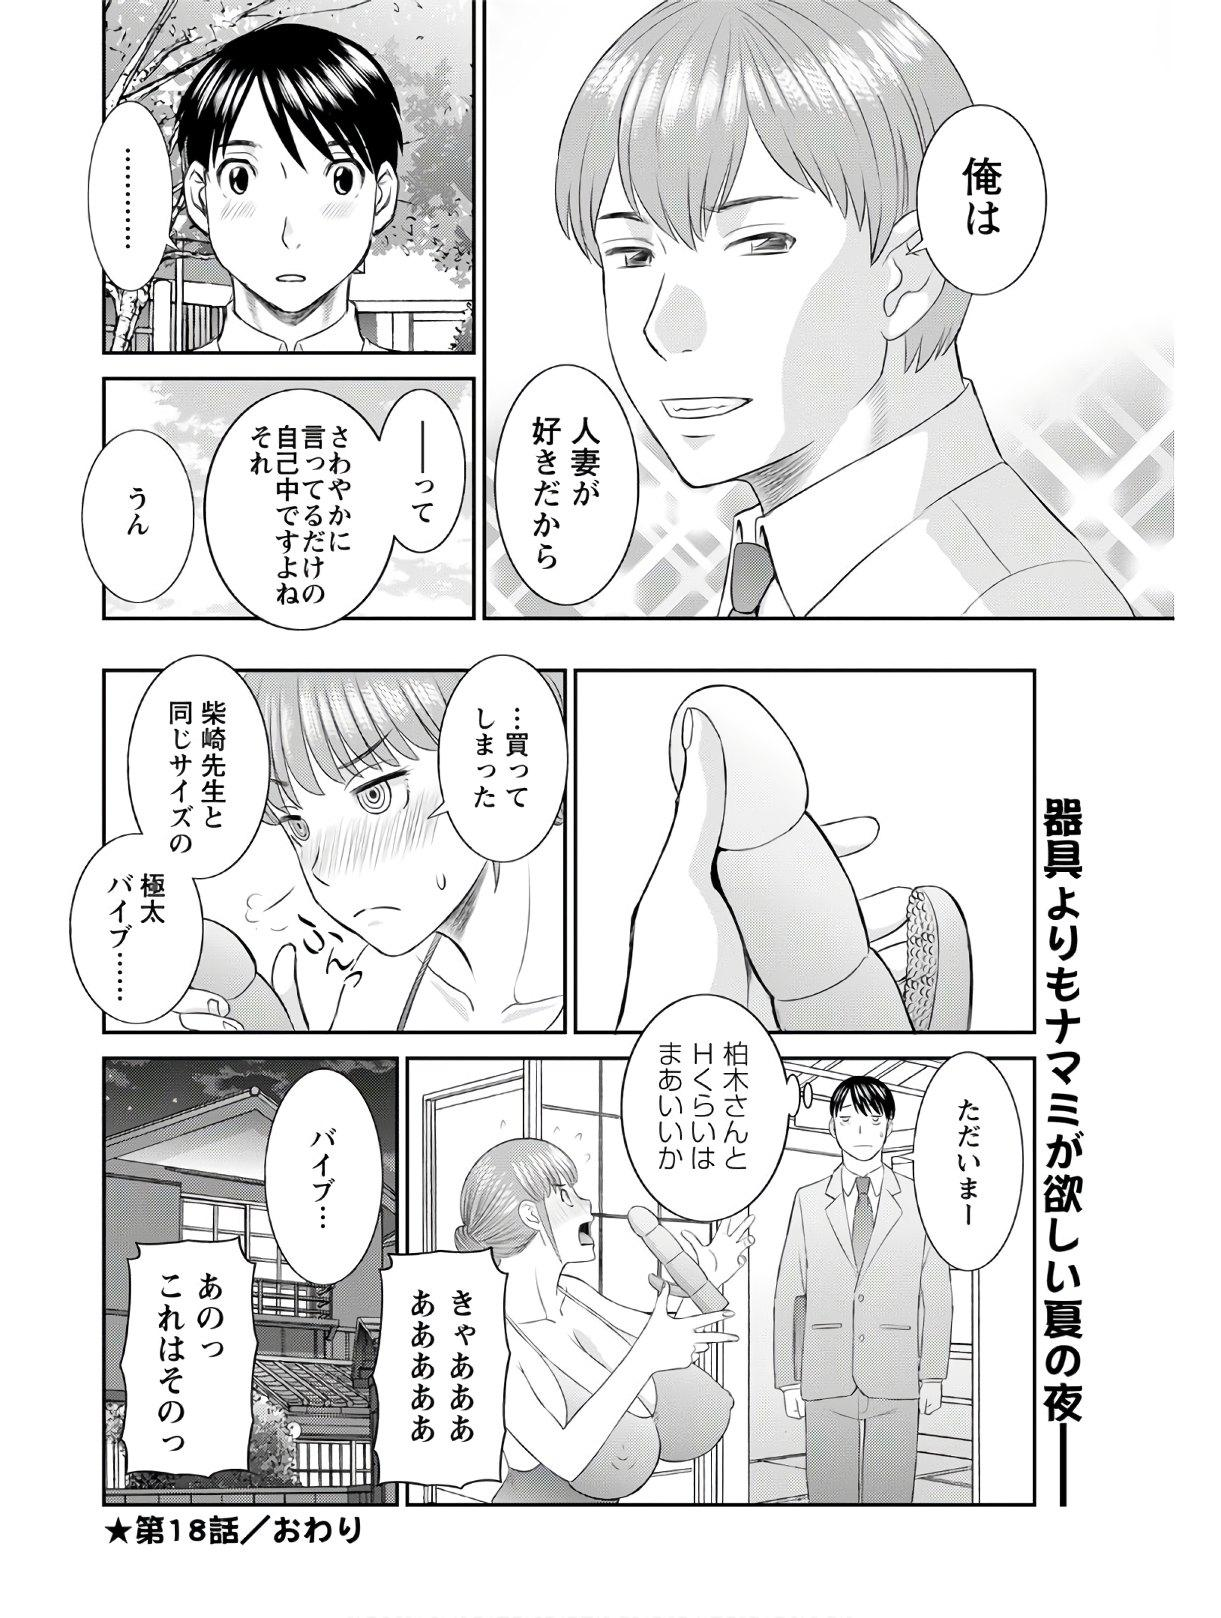 [Kawamori Misaki] Kaikan Hitotsuma Gakuen Ch. 1-6, 8-20 [Digital] 312